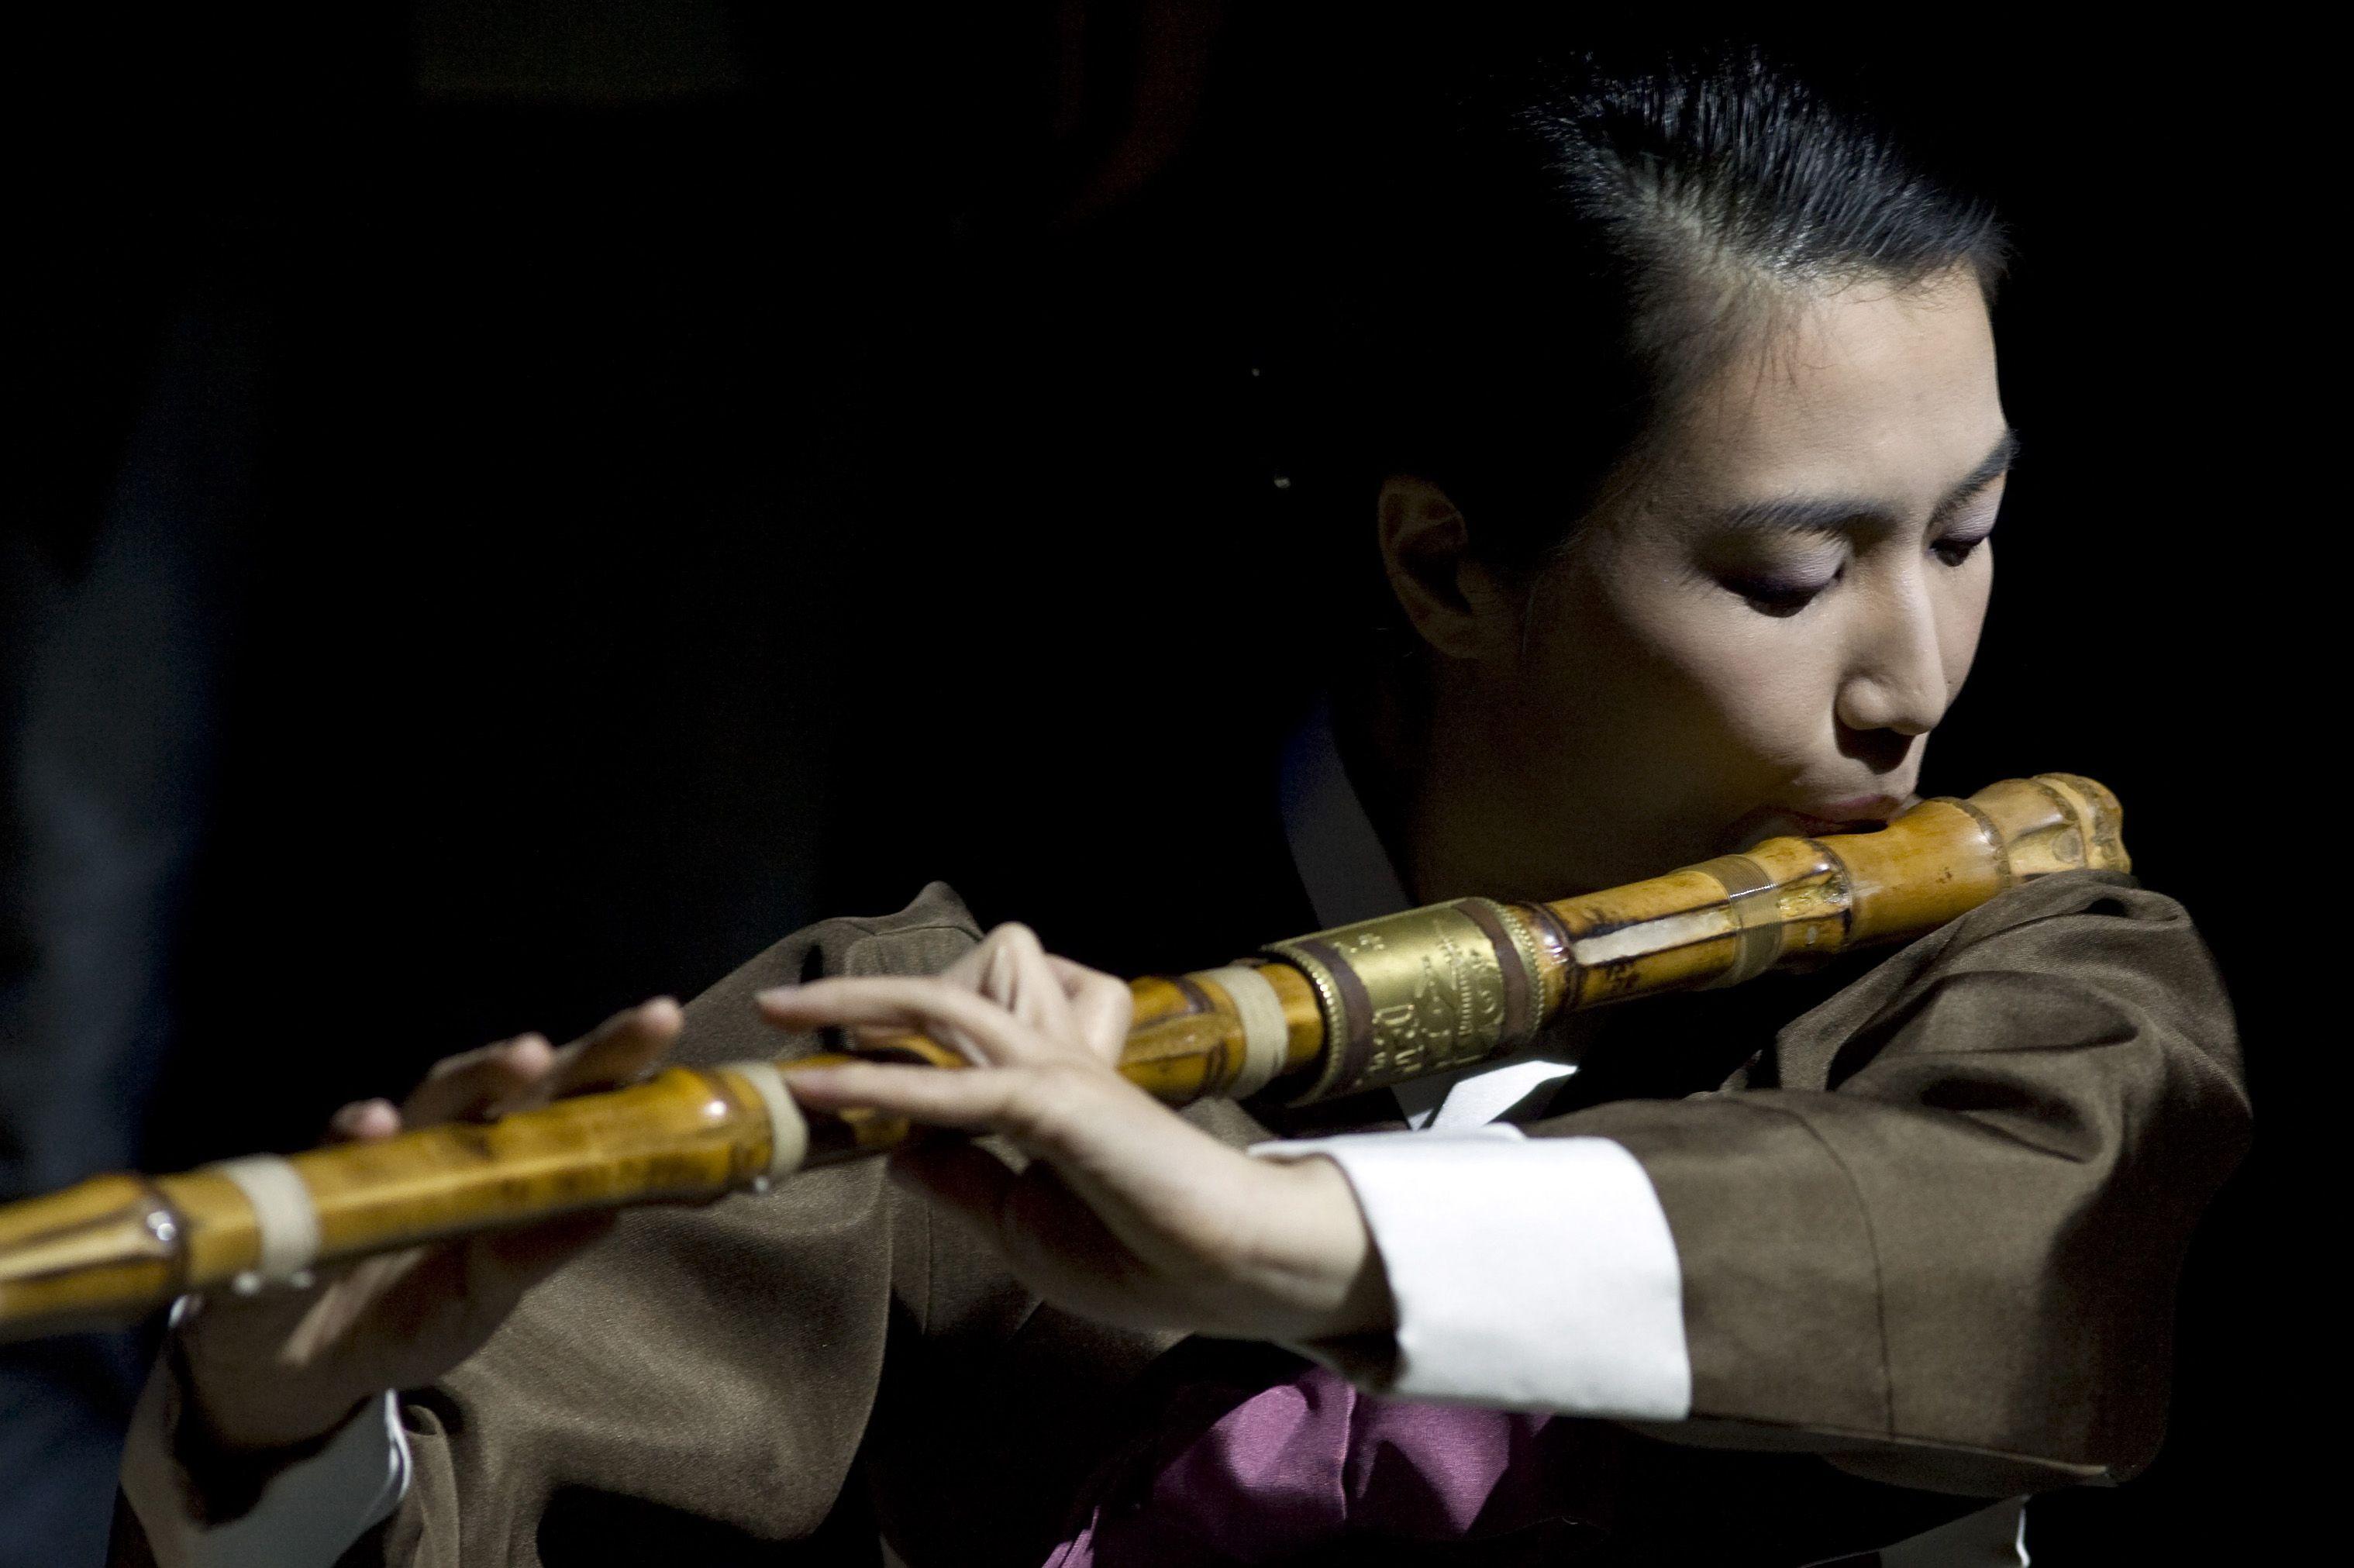 Playing the Korean Daegeum flute